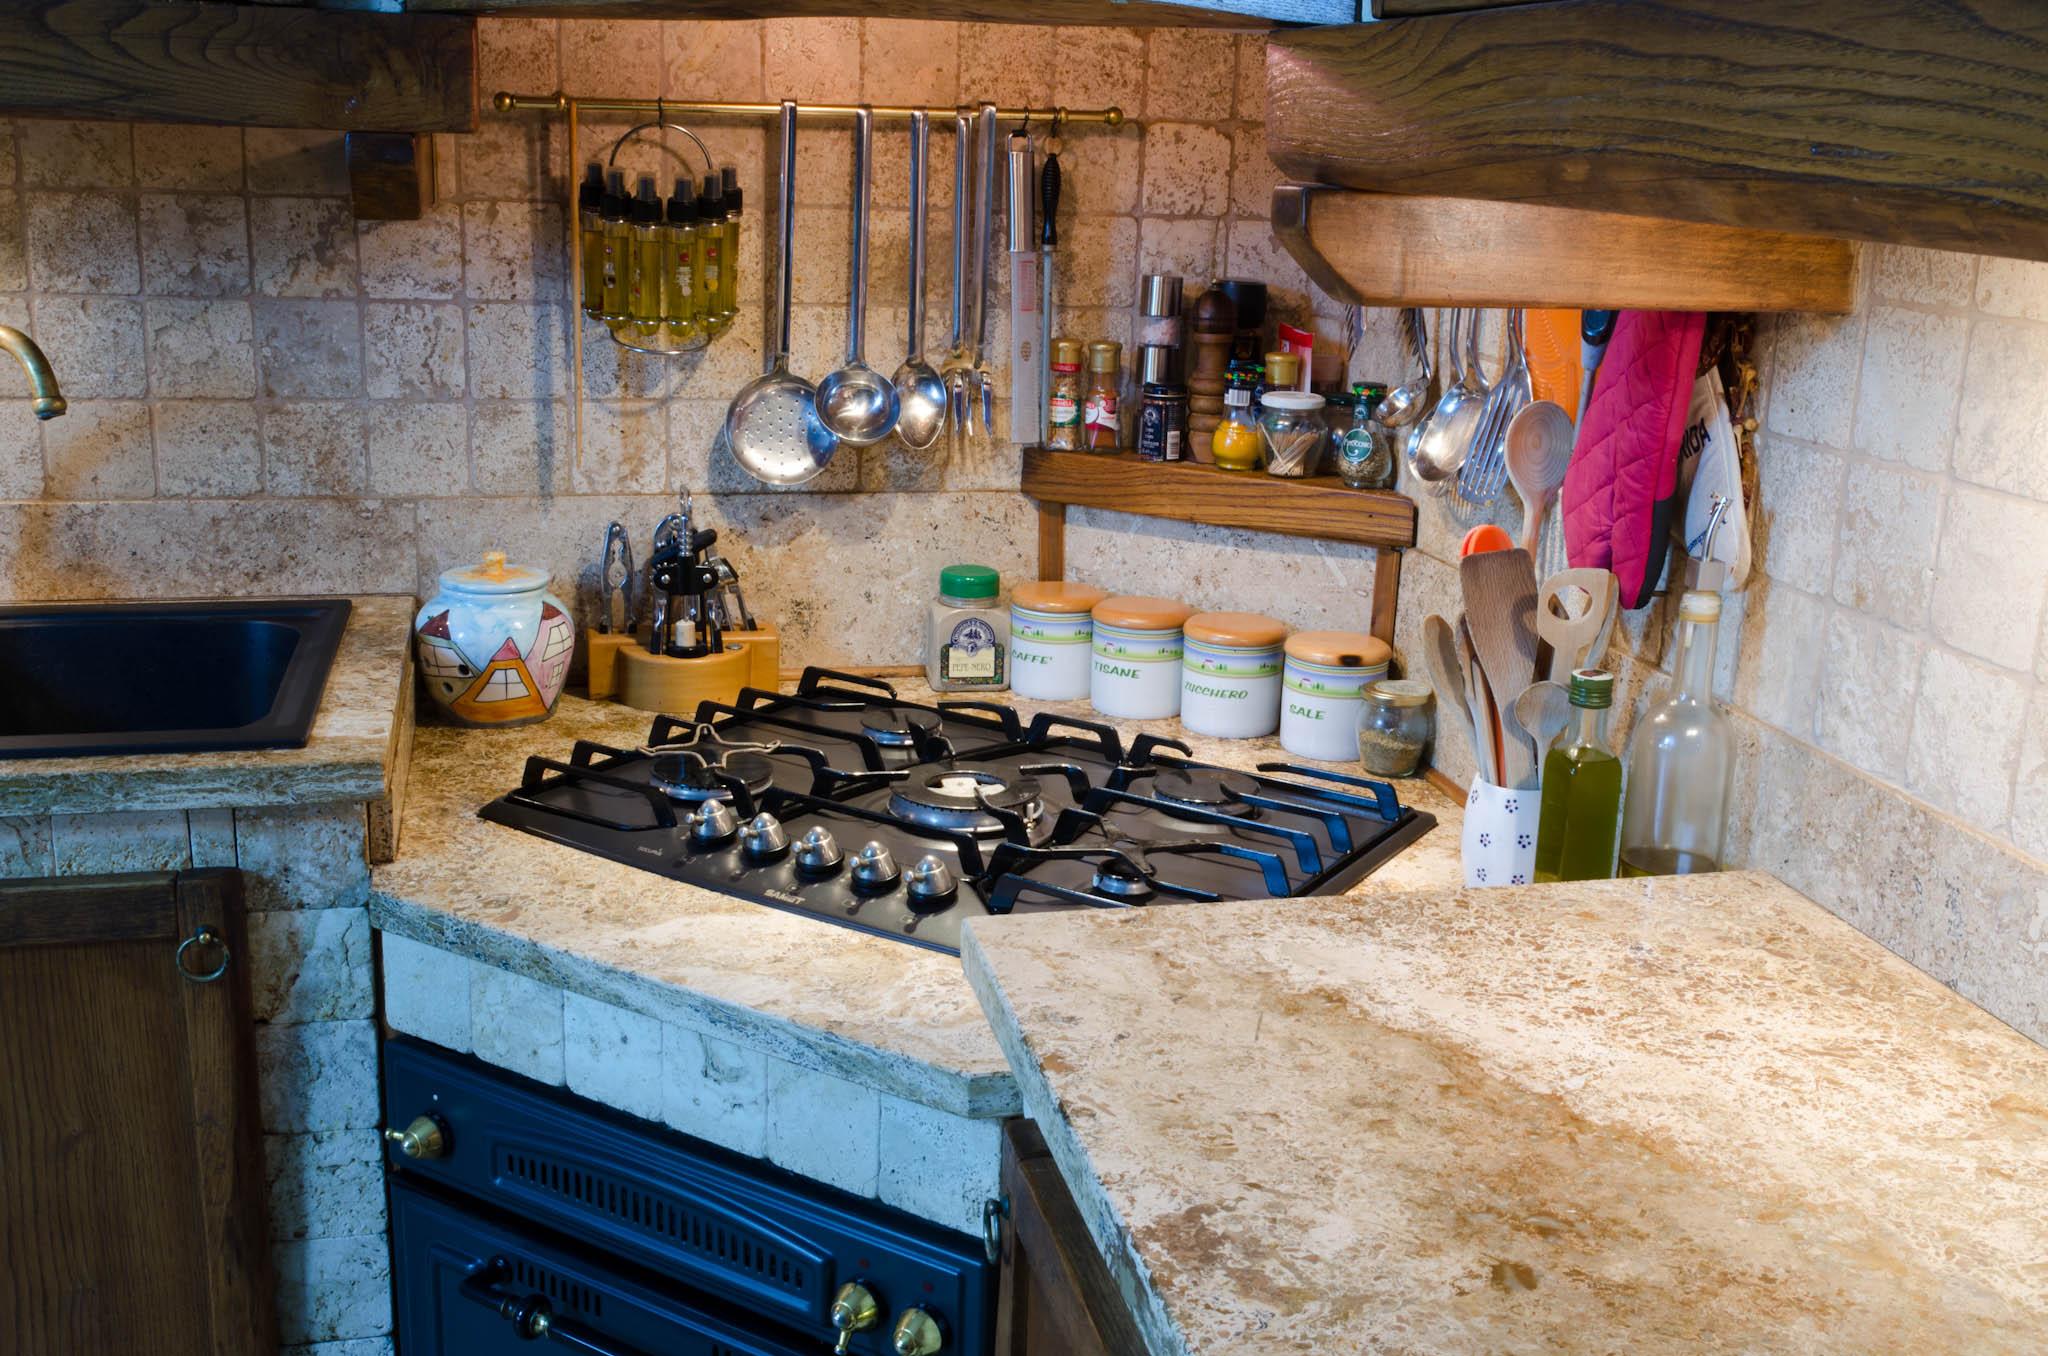 Piano Cucina In Marmo Travertino.Piani Cucina In Marmo E Travertino Pietre Di Rapolano